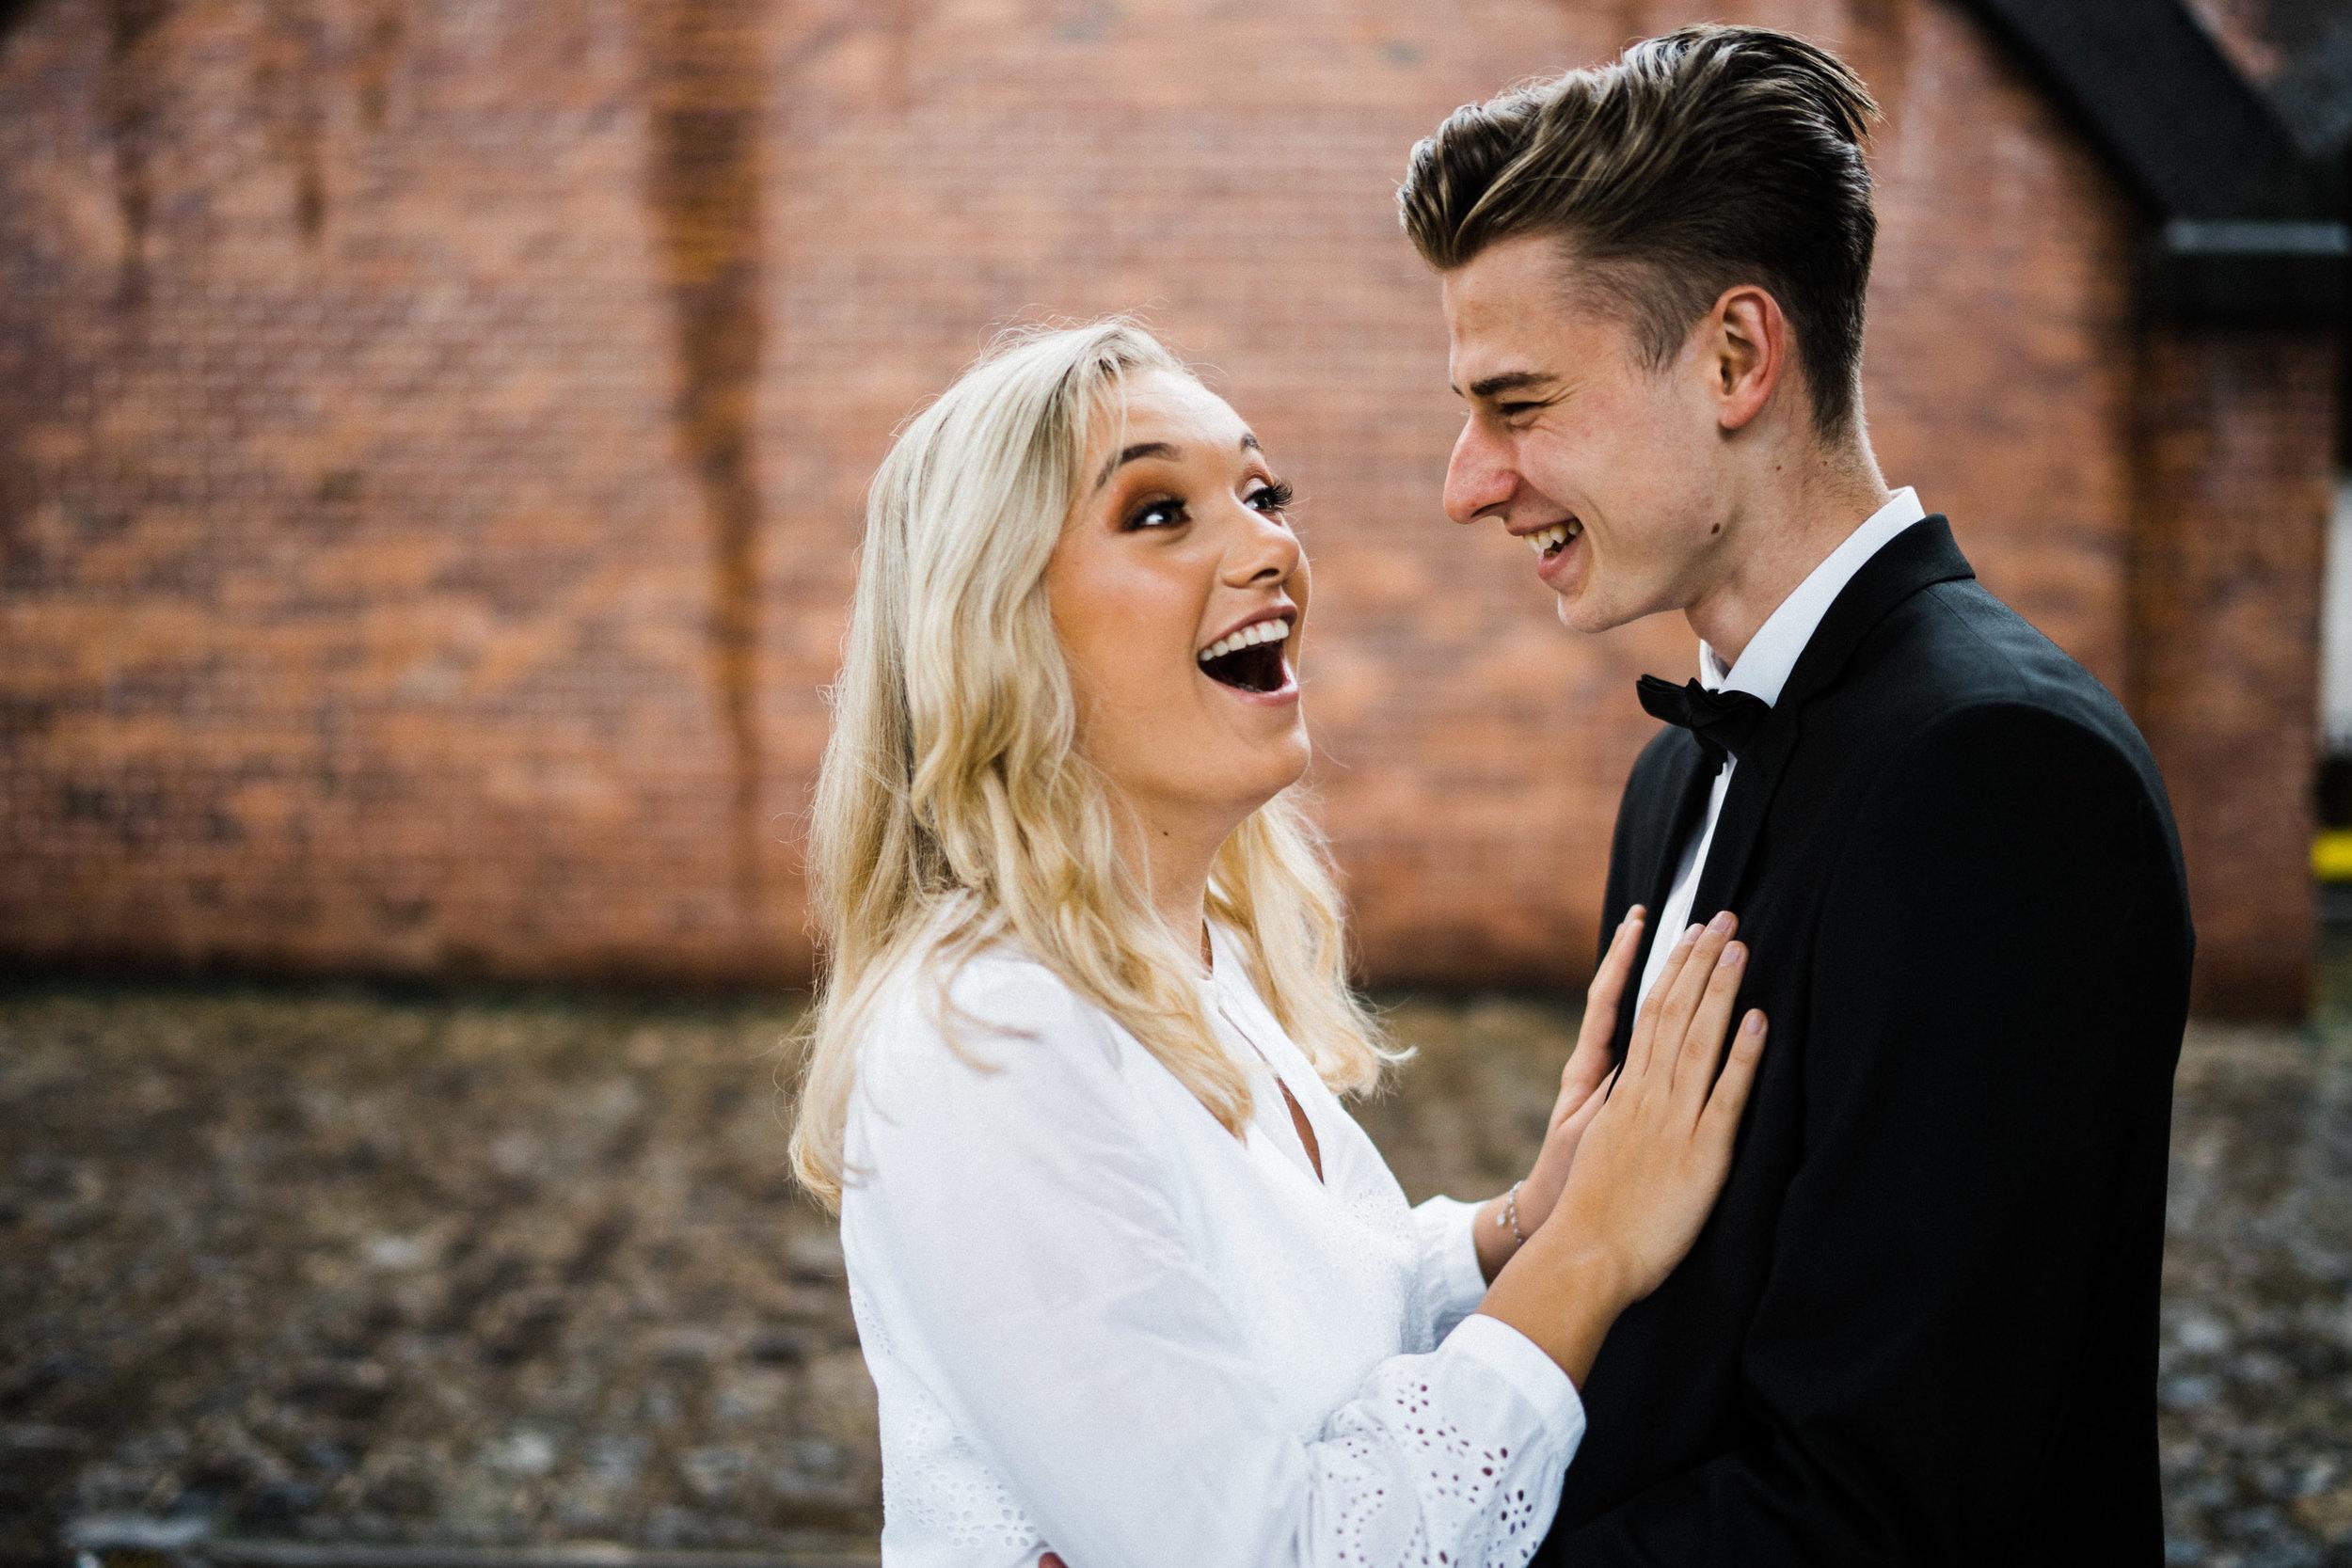 www.bytomw.com - Tom Wright - Manchester & Lake District Wedding Photographer -01009.jpg